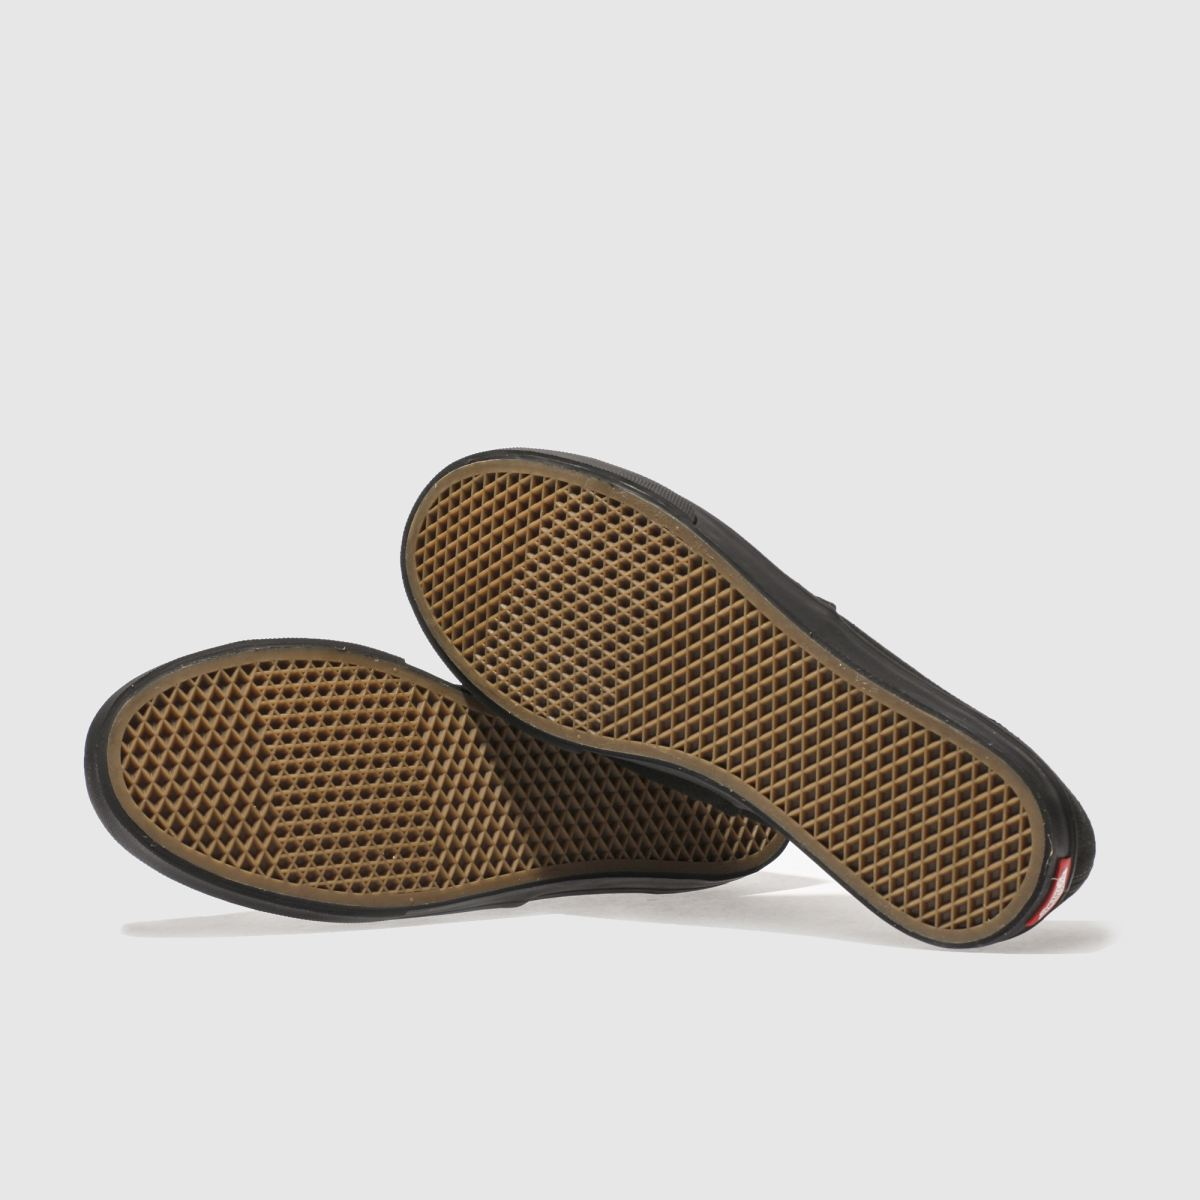 Damen Pro Schwarz vans Authentic Lo Pro Damen Sneaker   schuh Gute Qualität beliebte Schuhe d79080